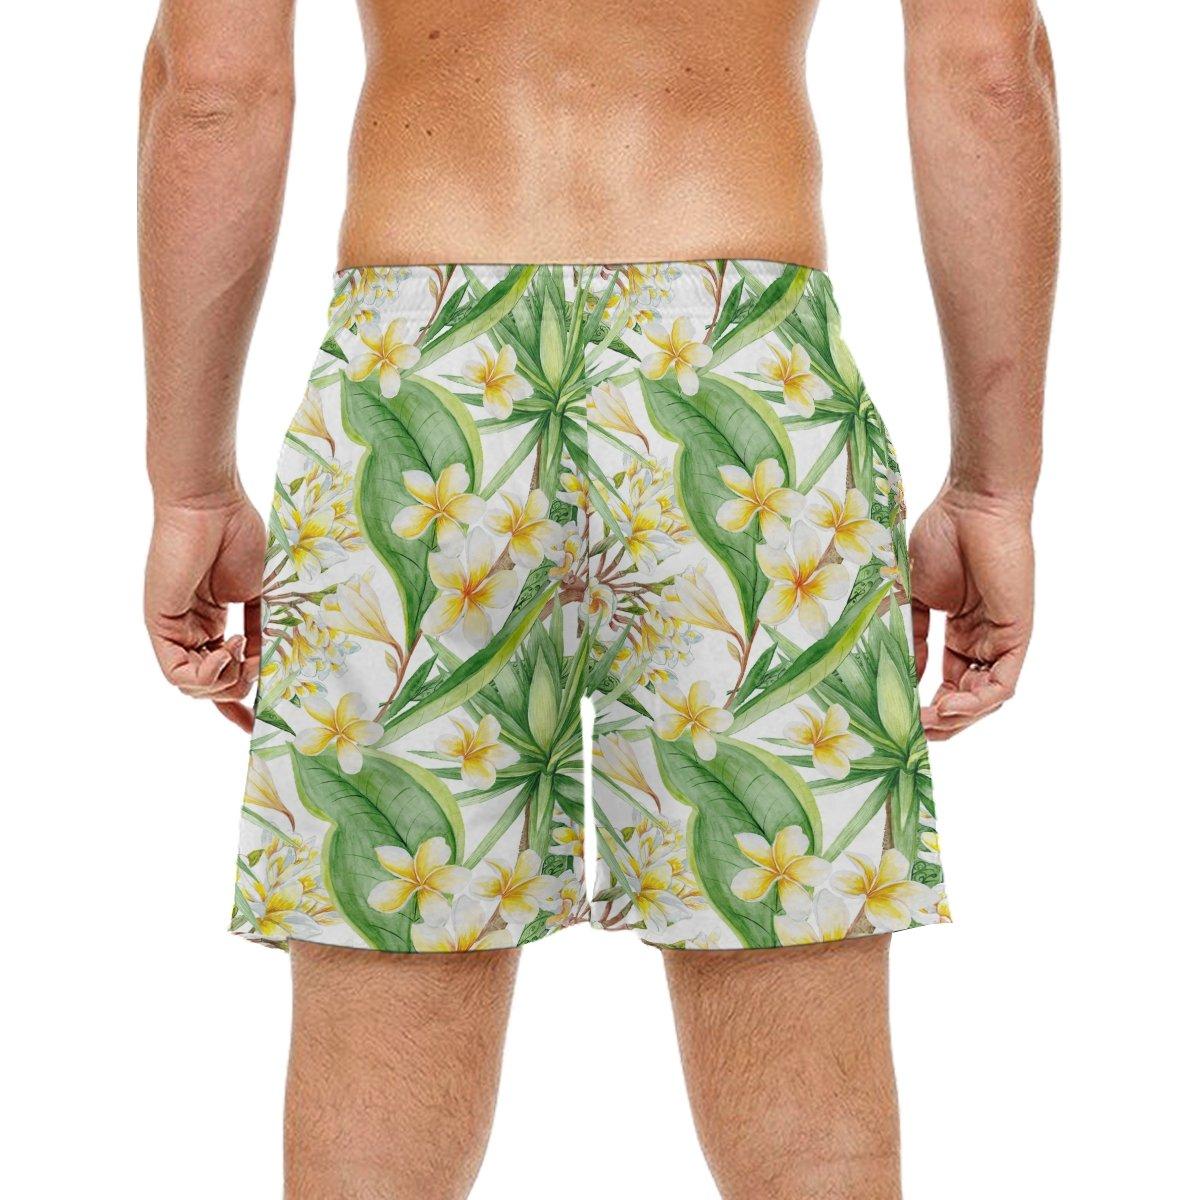 KEAKIA Mens Botanic Tropical Pattern Beach Board Shorts Quick Dry Swim Trunk